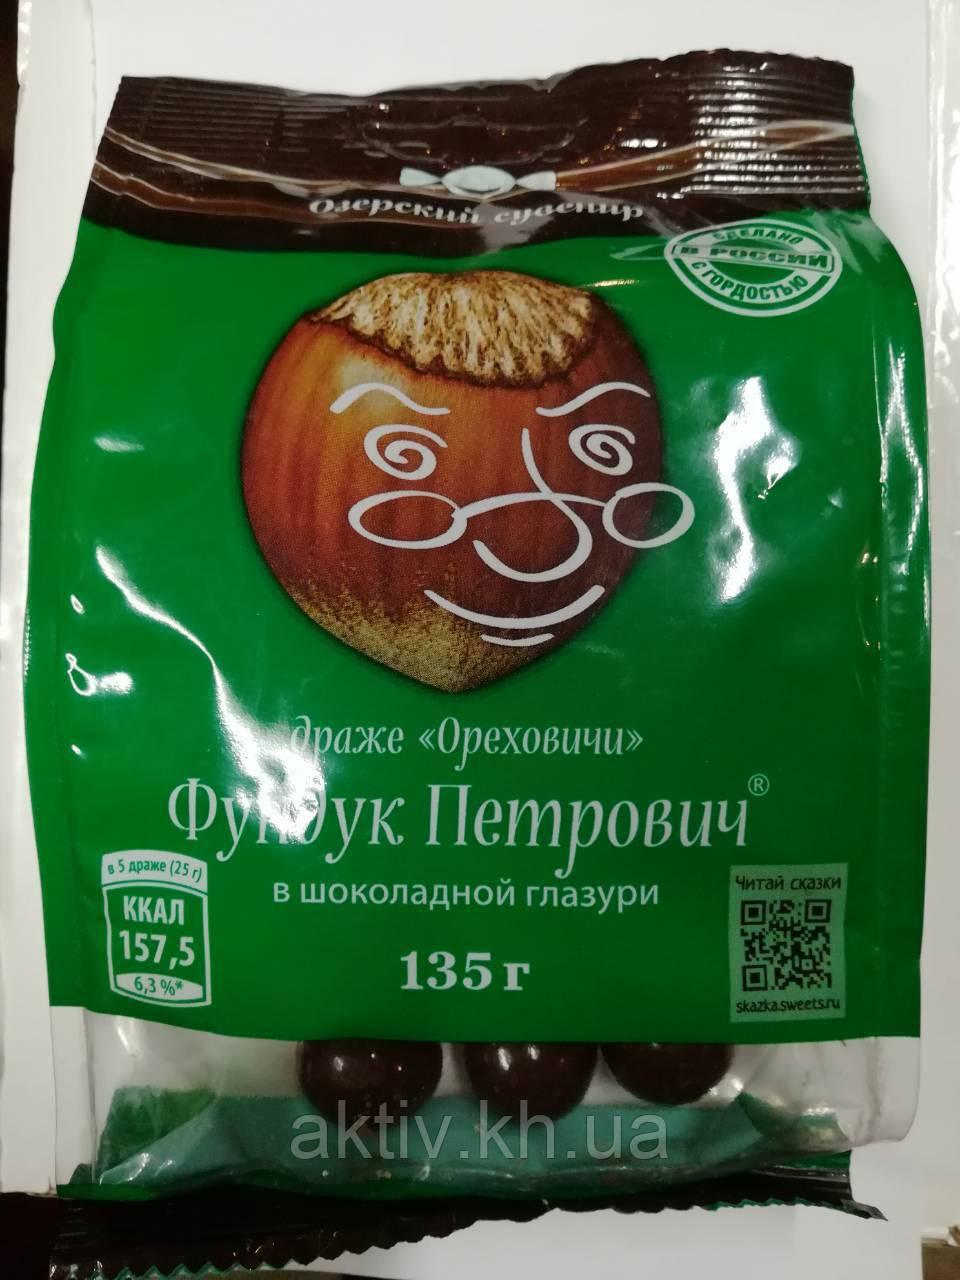 Цукерки Фундук Петрович 135 гр